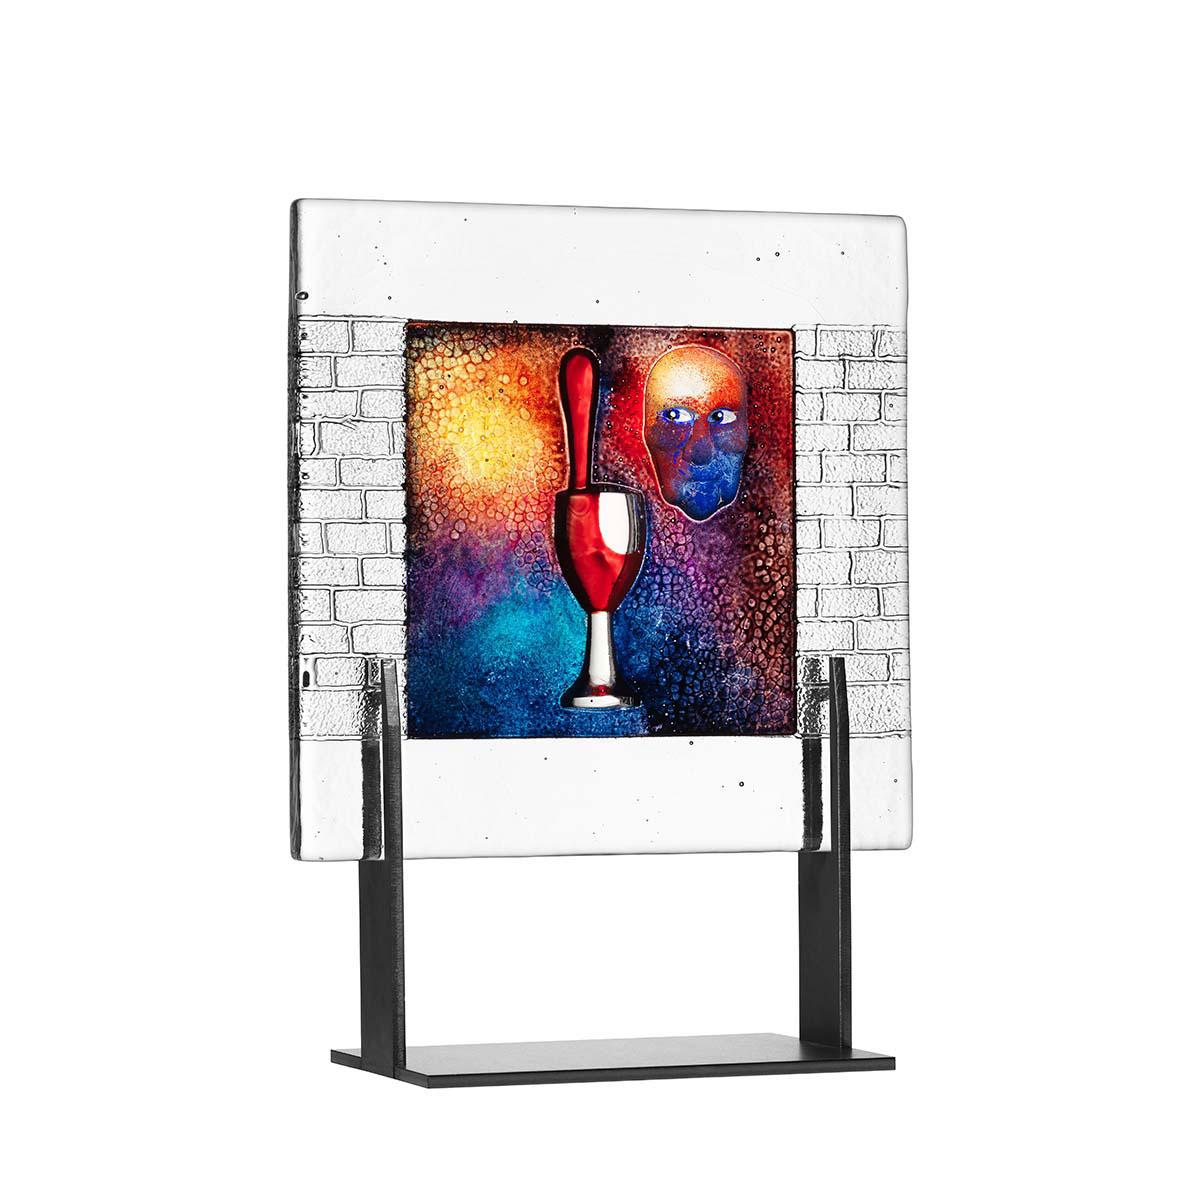 Kosta Boda Art Glass, Kjell Engman Drop, Limited Edition of 60